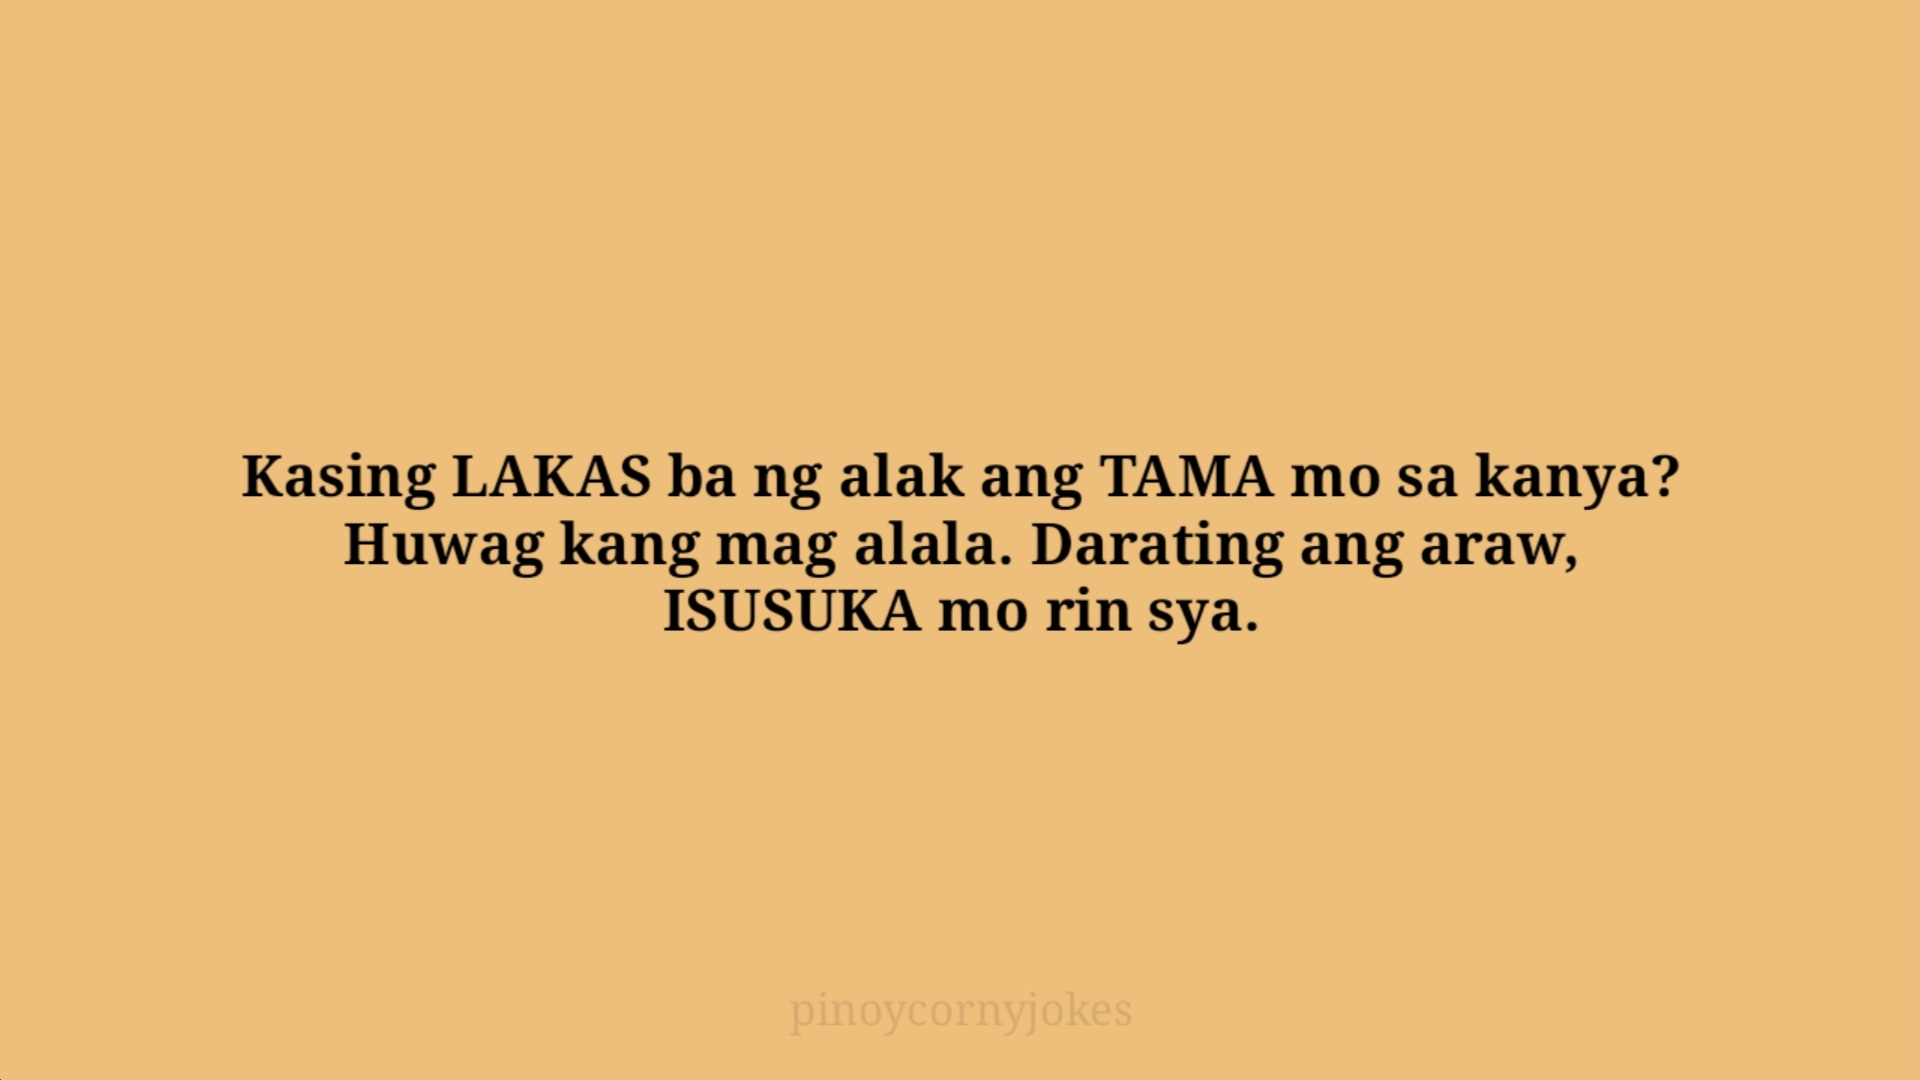 lakas tama joke time tagalog